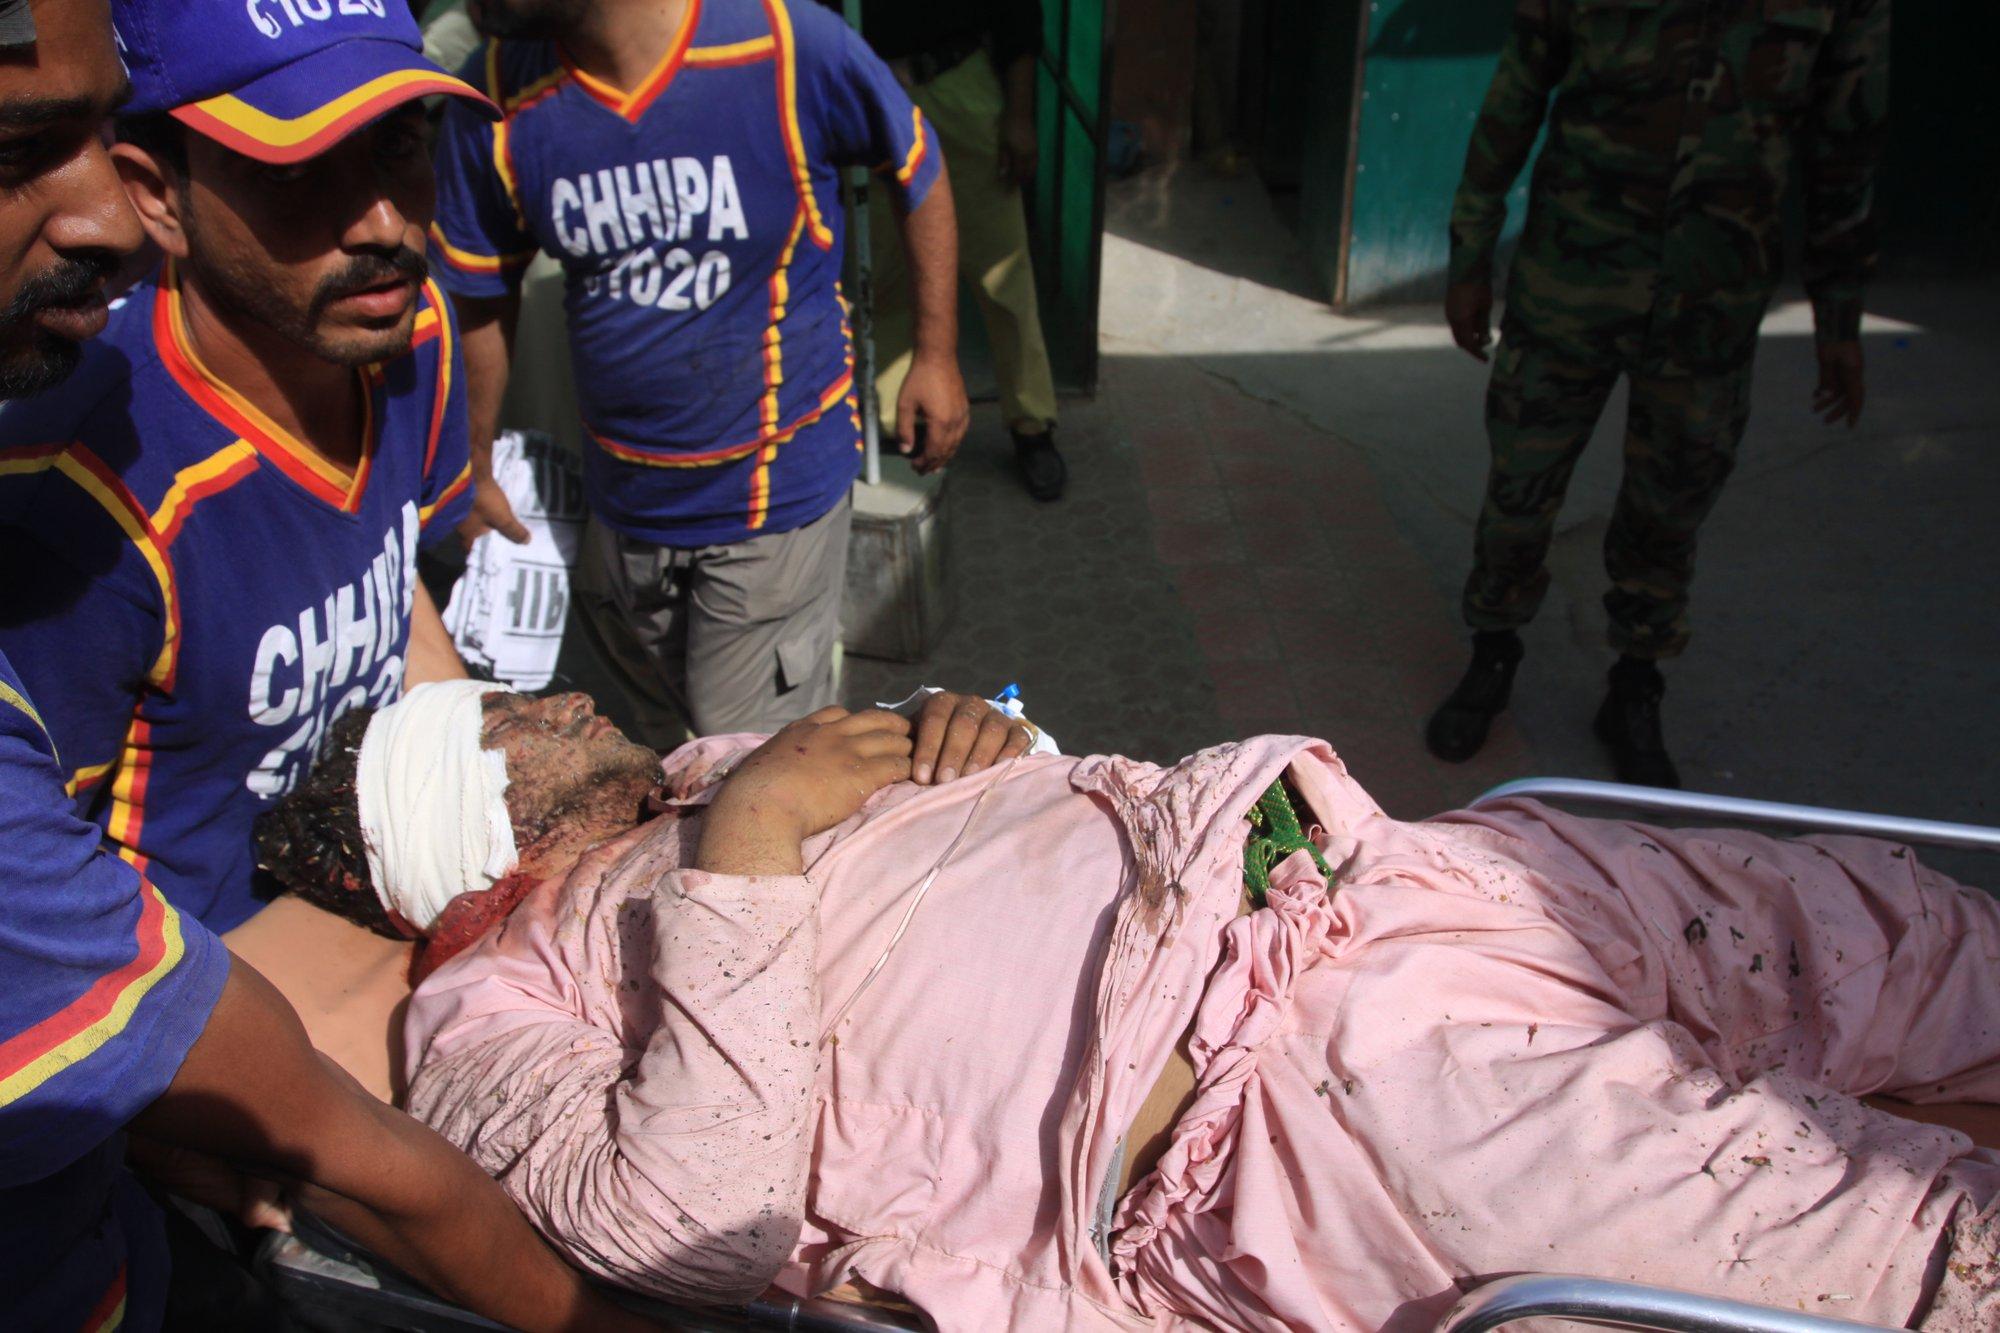 Police: Mosque bombing in southwest Pakistan kills 4 people